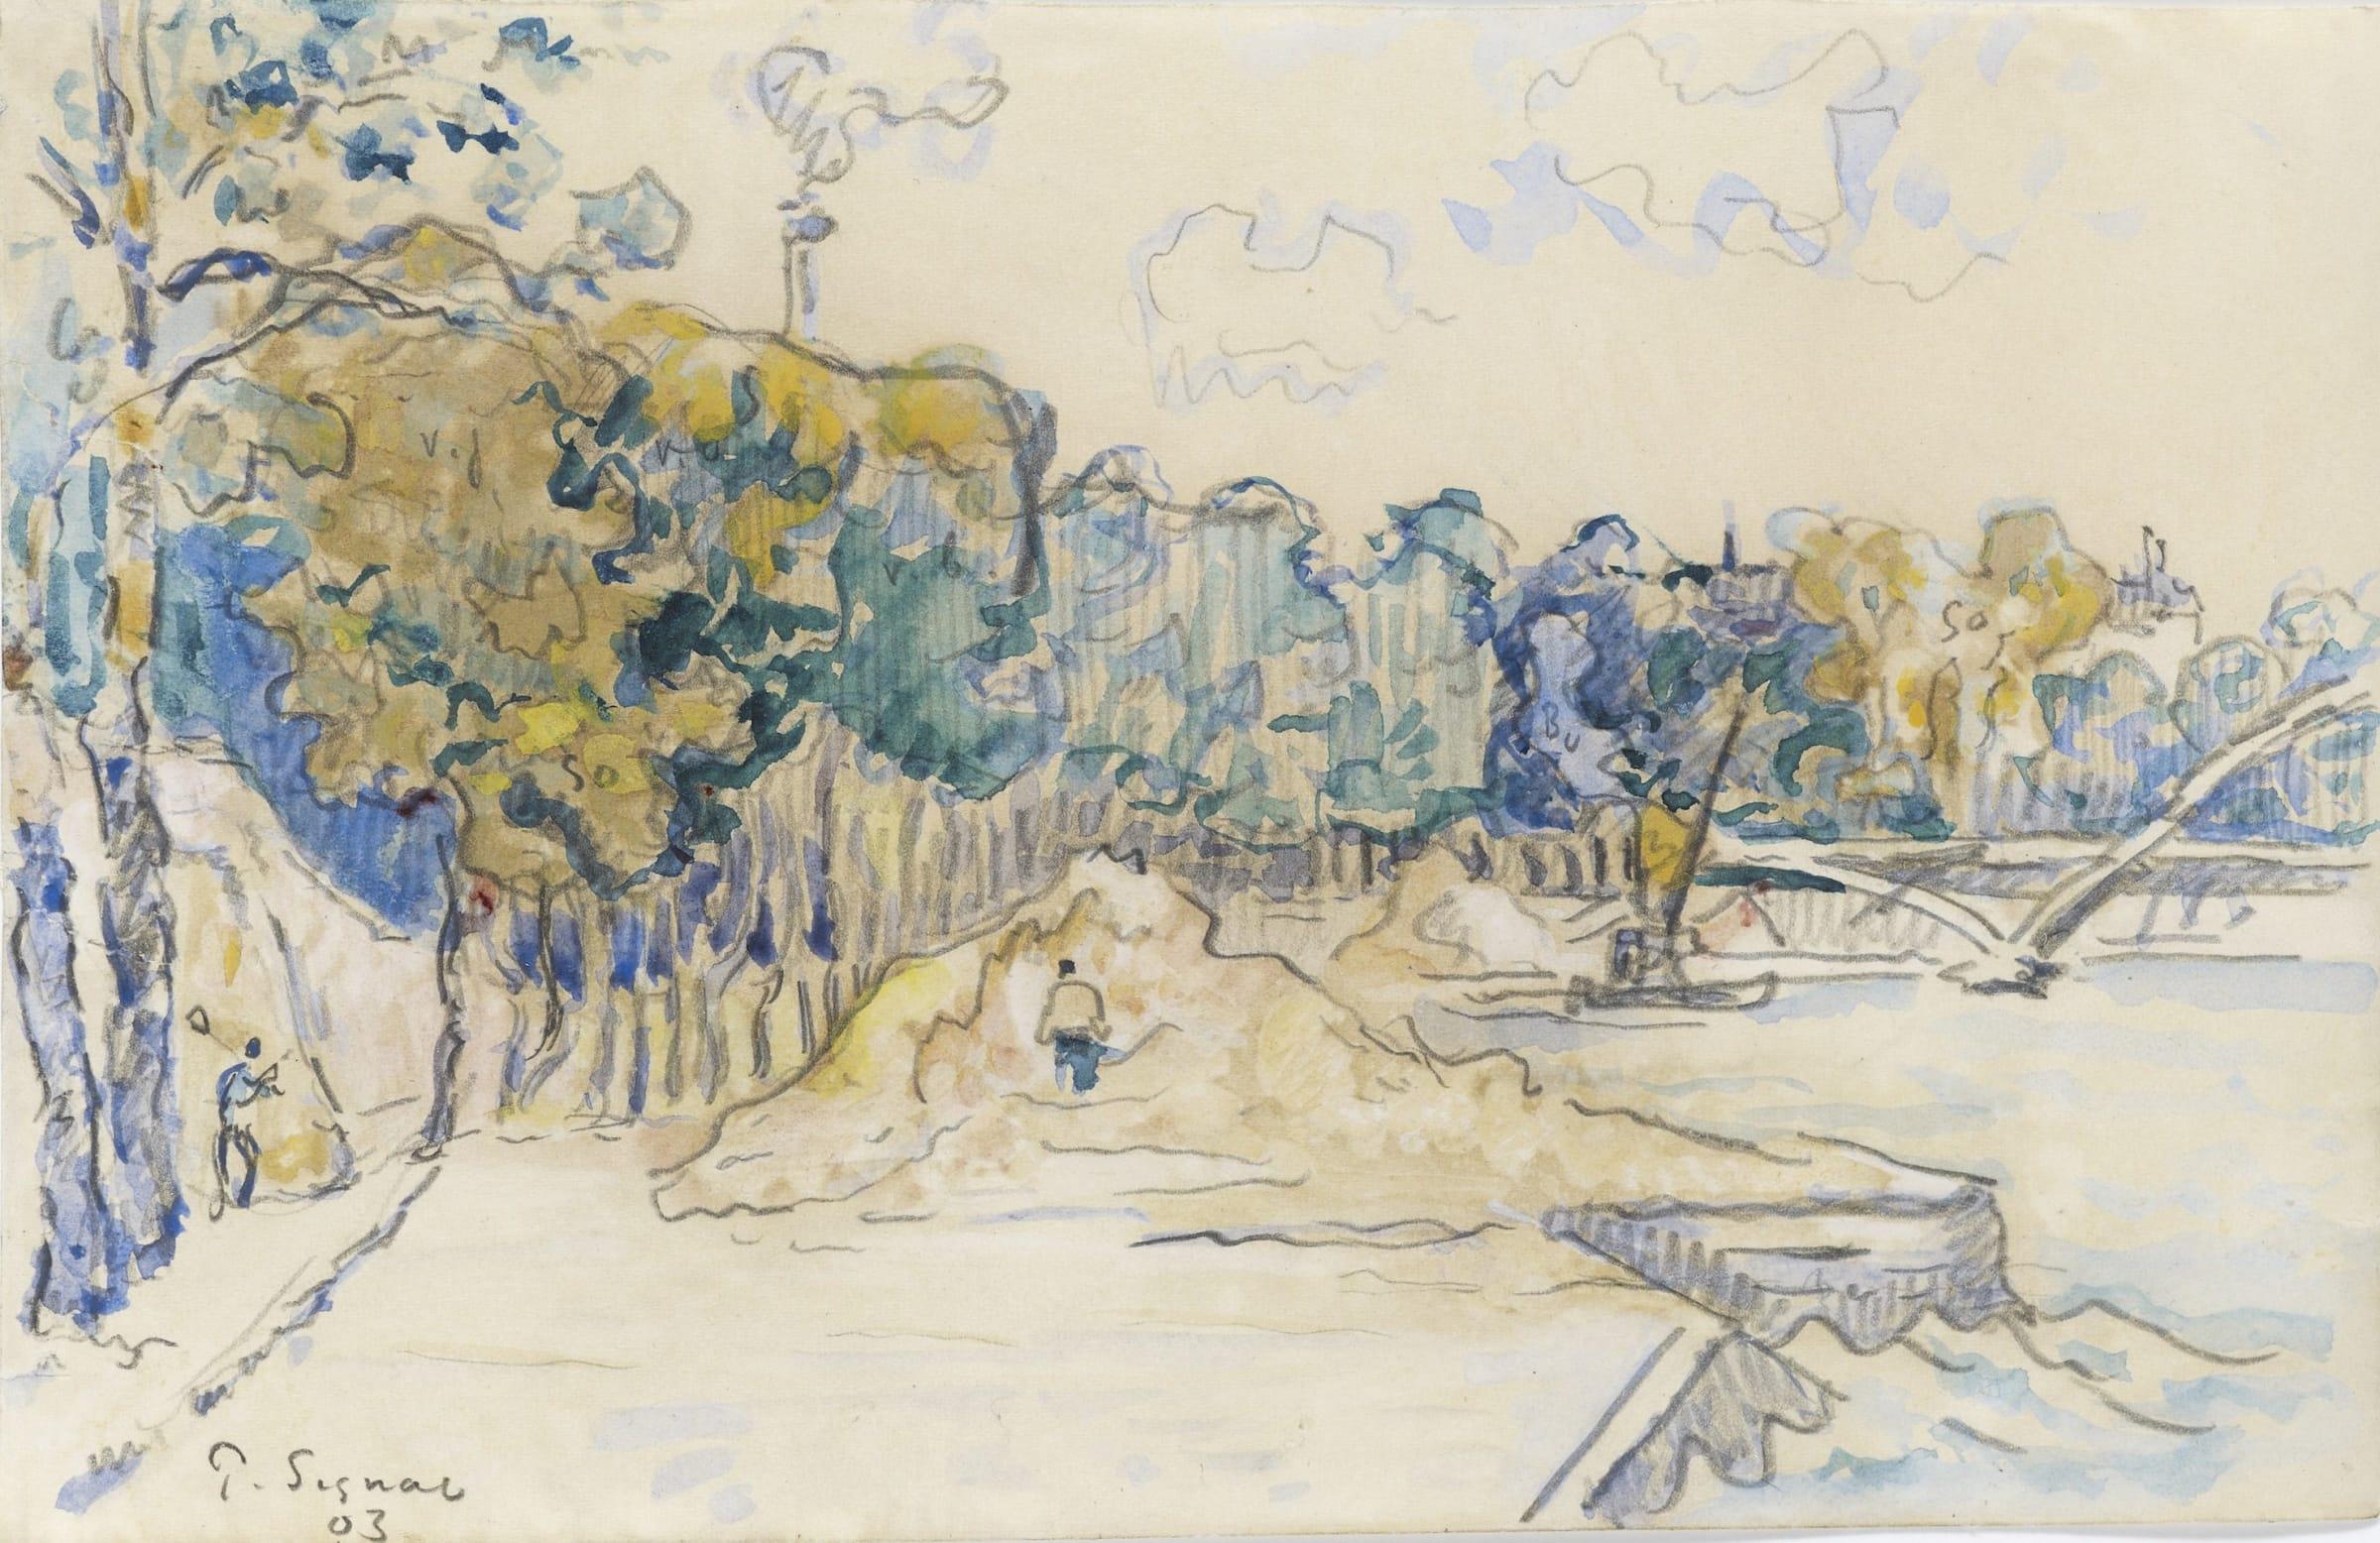 <span class=&#34;link fancybox-details-link&#34;><a href=&#34;/artists/75-paul-signac/works/9417-paul-signac-paris-la-passerelle-debilly-1903/&#34;>View Detail Page</a></span><div class=&#34;artist&#34;><span class=&#34;artist&#34;><strong>Paul Signac</strong></span></div><div class=&#34;title&#34;><em>Paris, la passerelle Debilly</em>, 1903</div><div class=&#34;signed_and_dated&#34;>Signed and dated lower left P.Signac 03 Signed, titled and dated on reverse.</div><div class=&#34;medium&#34;>Watercolour and pencil on paper</div><div class=&#34;dimensions&#34;>14 x 22.3 cm<br /> 5 ½ x 8 5/8 inches</div>